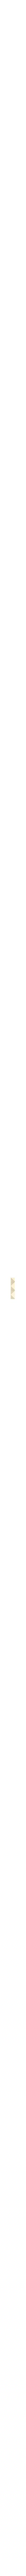 origami inspired mezuzah